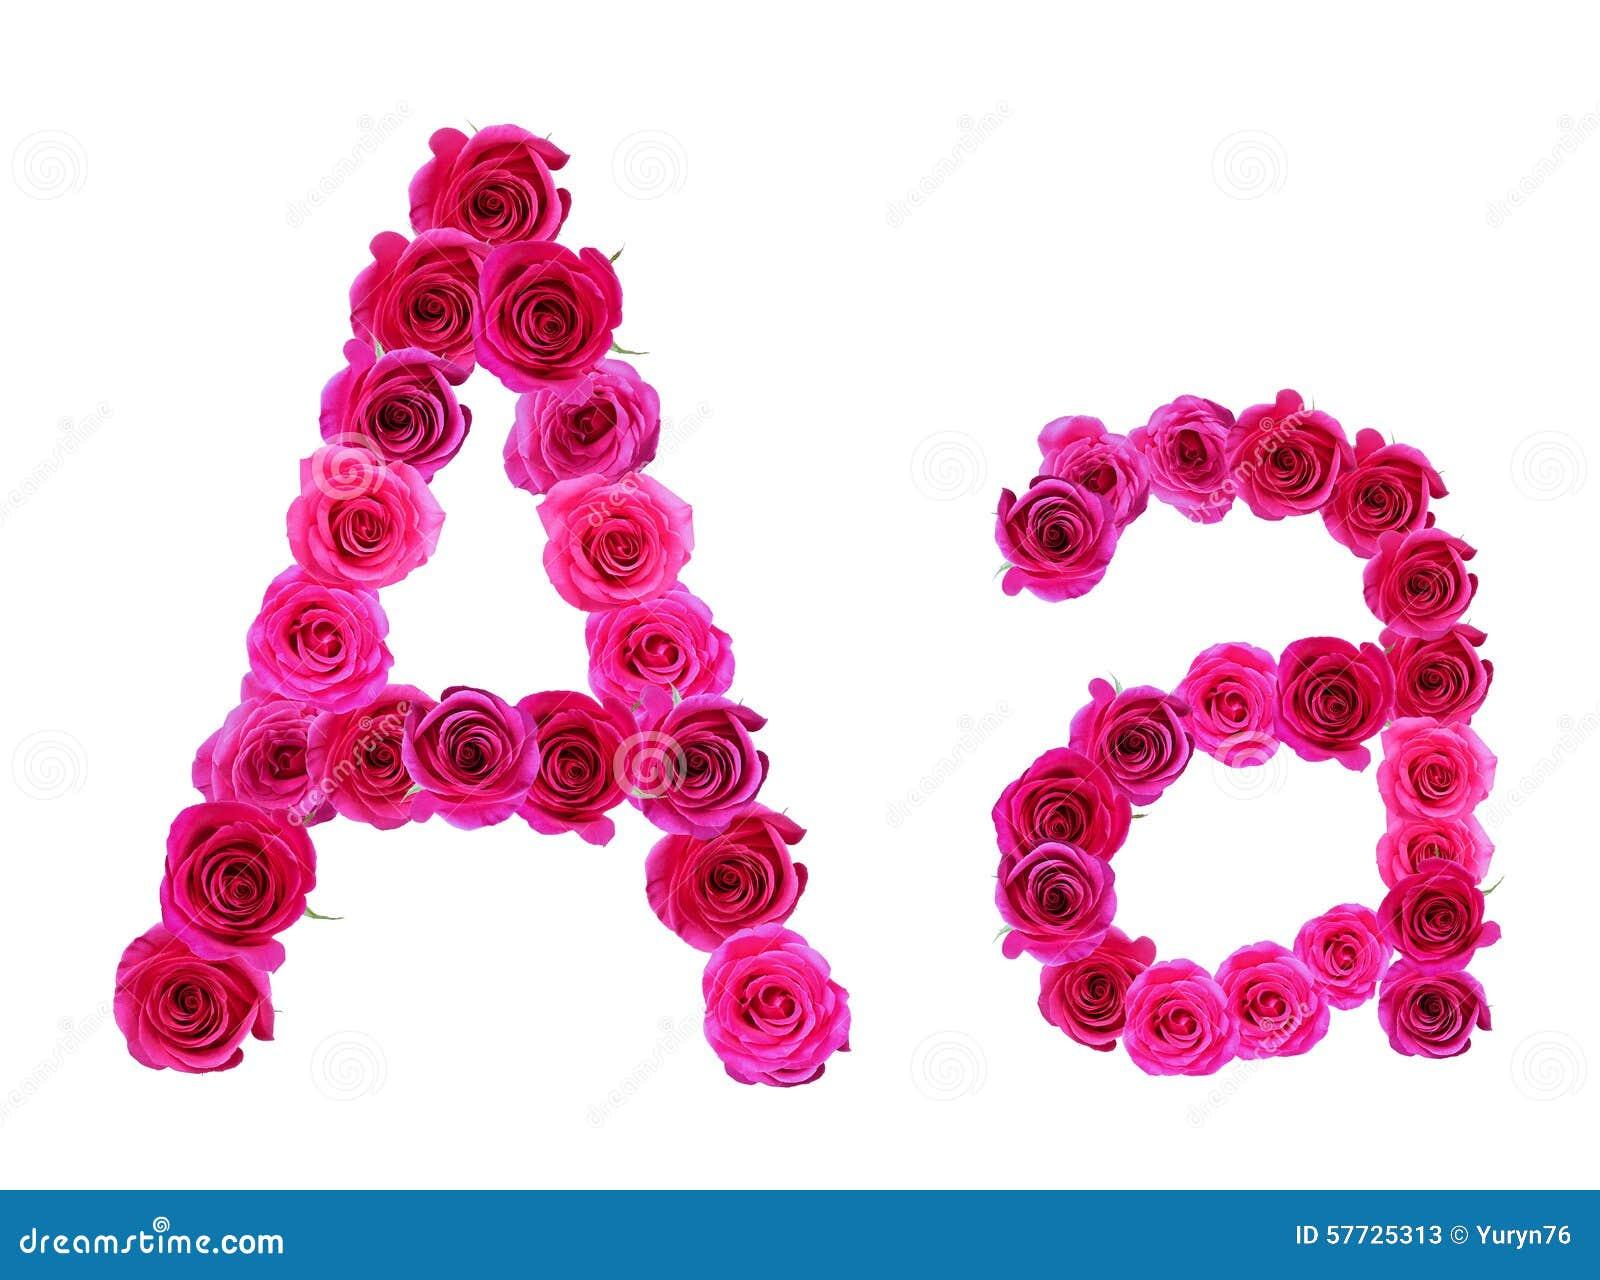 Alphabet Of Roses Stock Photo - Image: 57725313